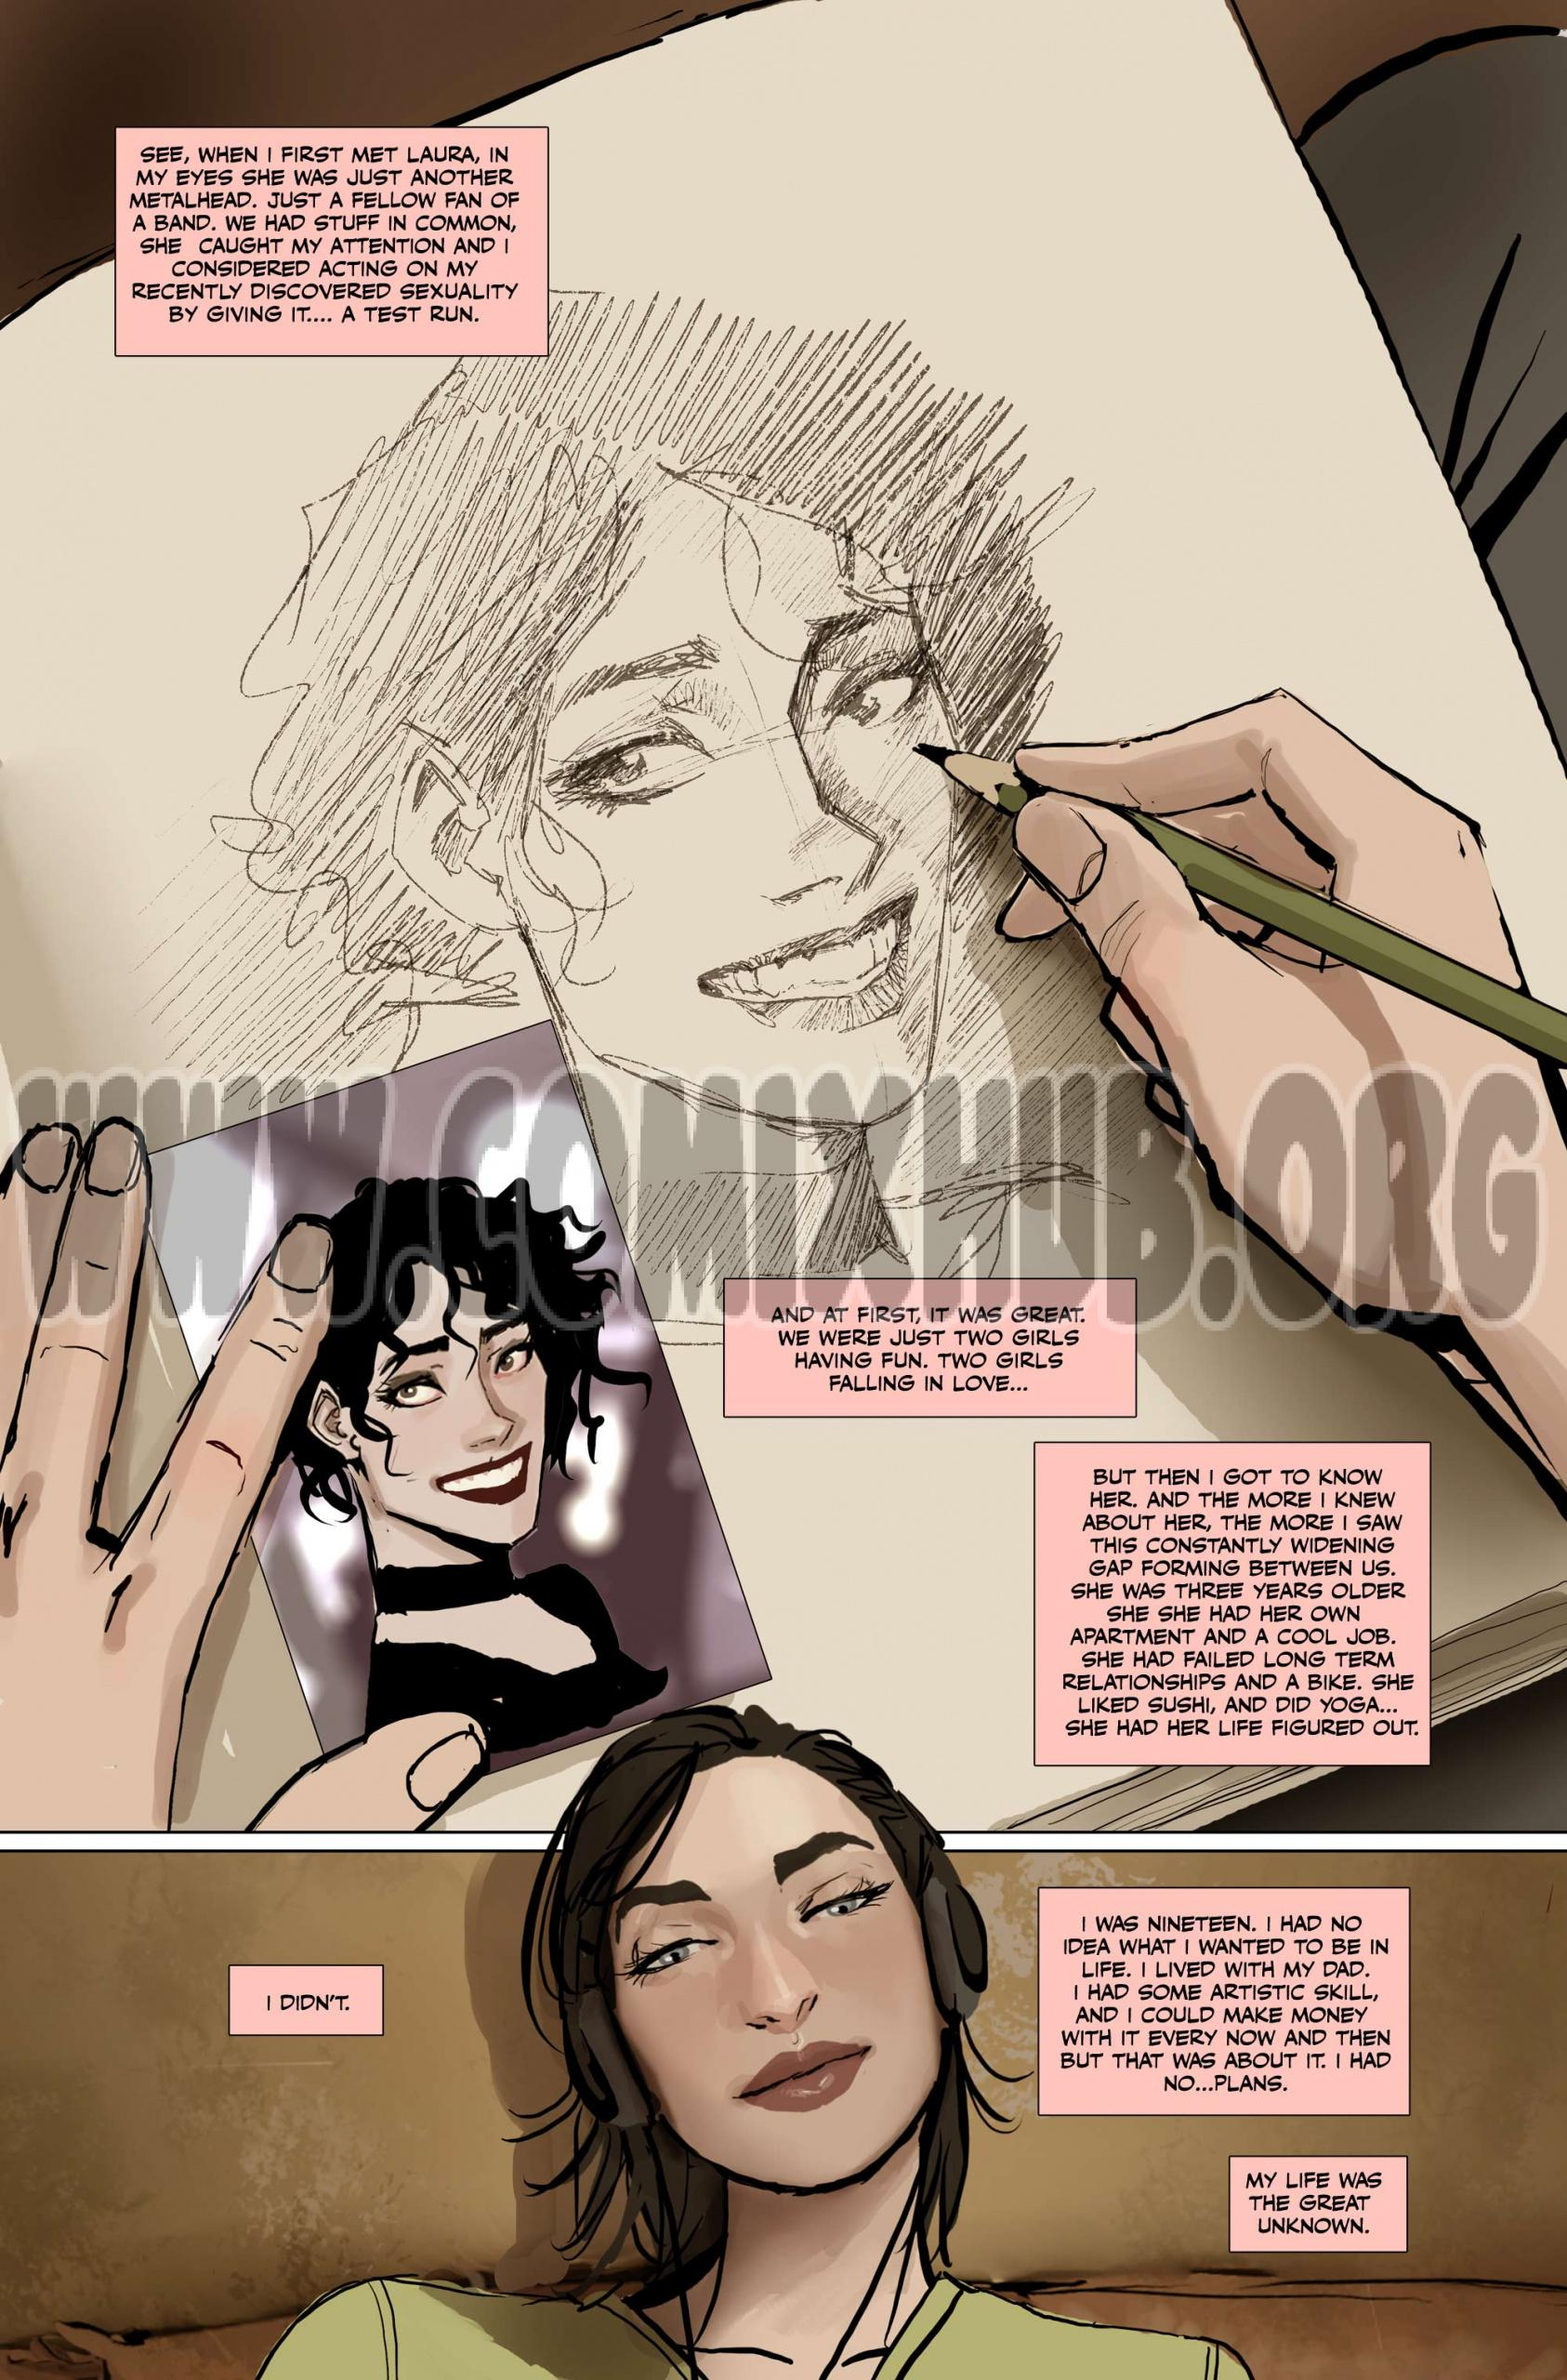 Sunstone - Volume 7 Oral sex, BDSM, Bikini, Blowjob, Femdom, Latex, Lesbians, Stockings, Submission